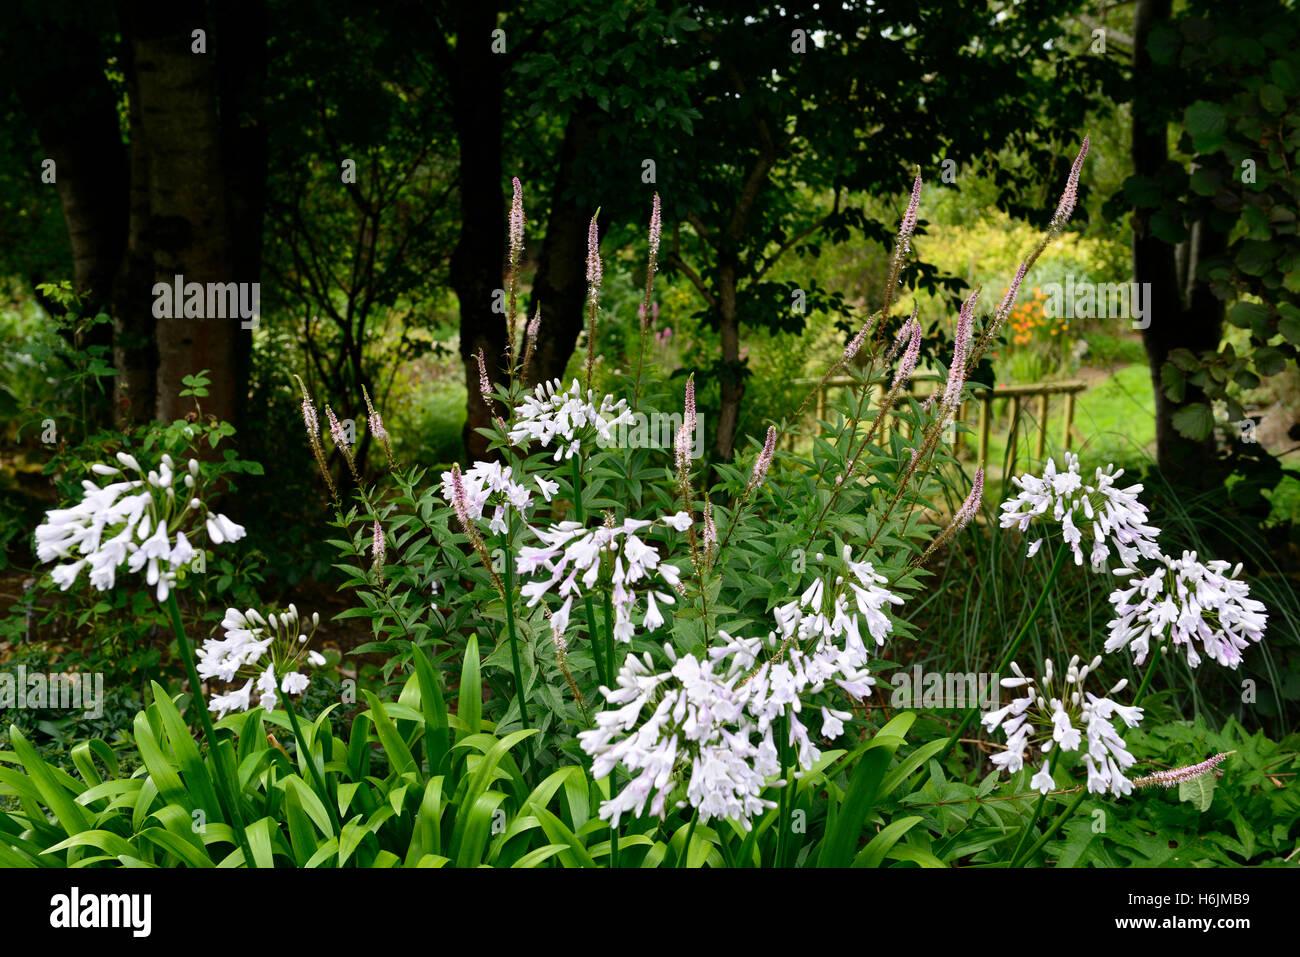 Agapanthus Windsor Grey Nile Lily White Flower Flowers Stock